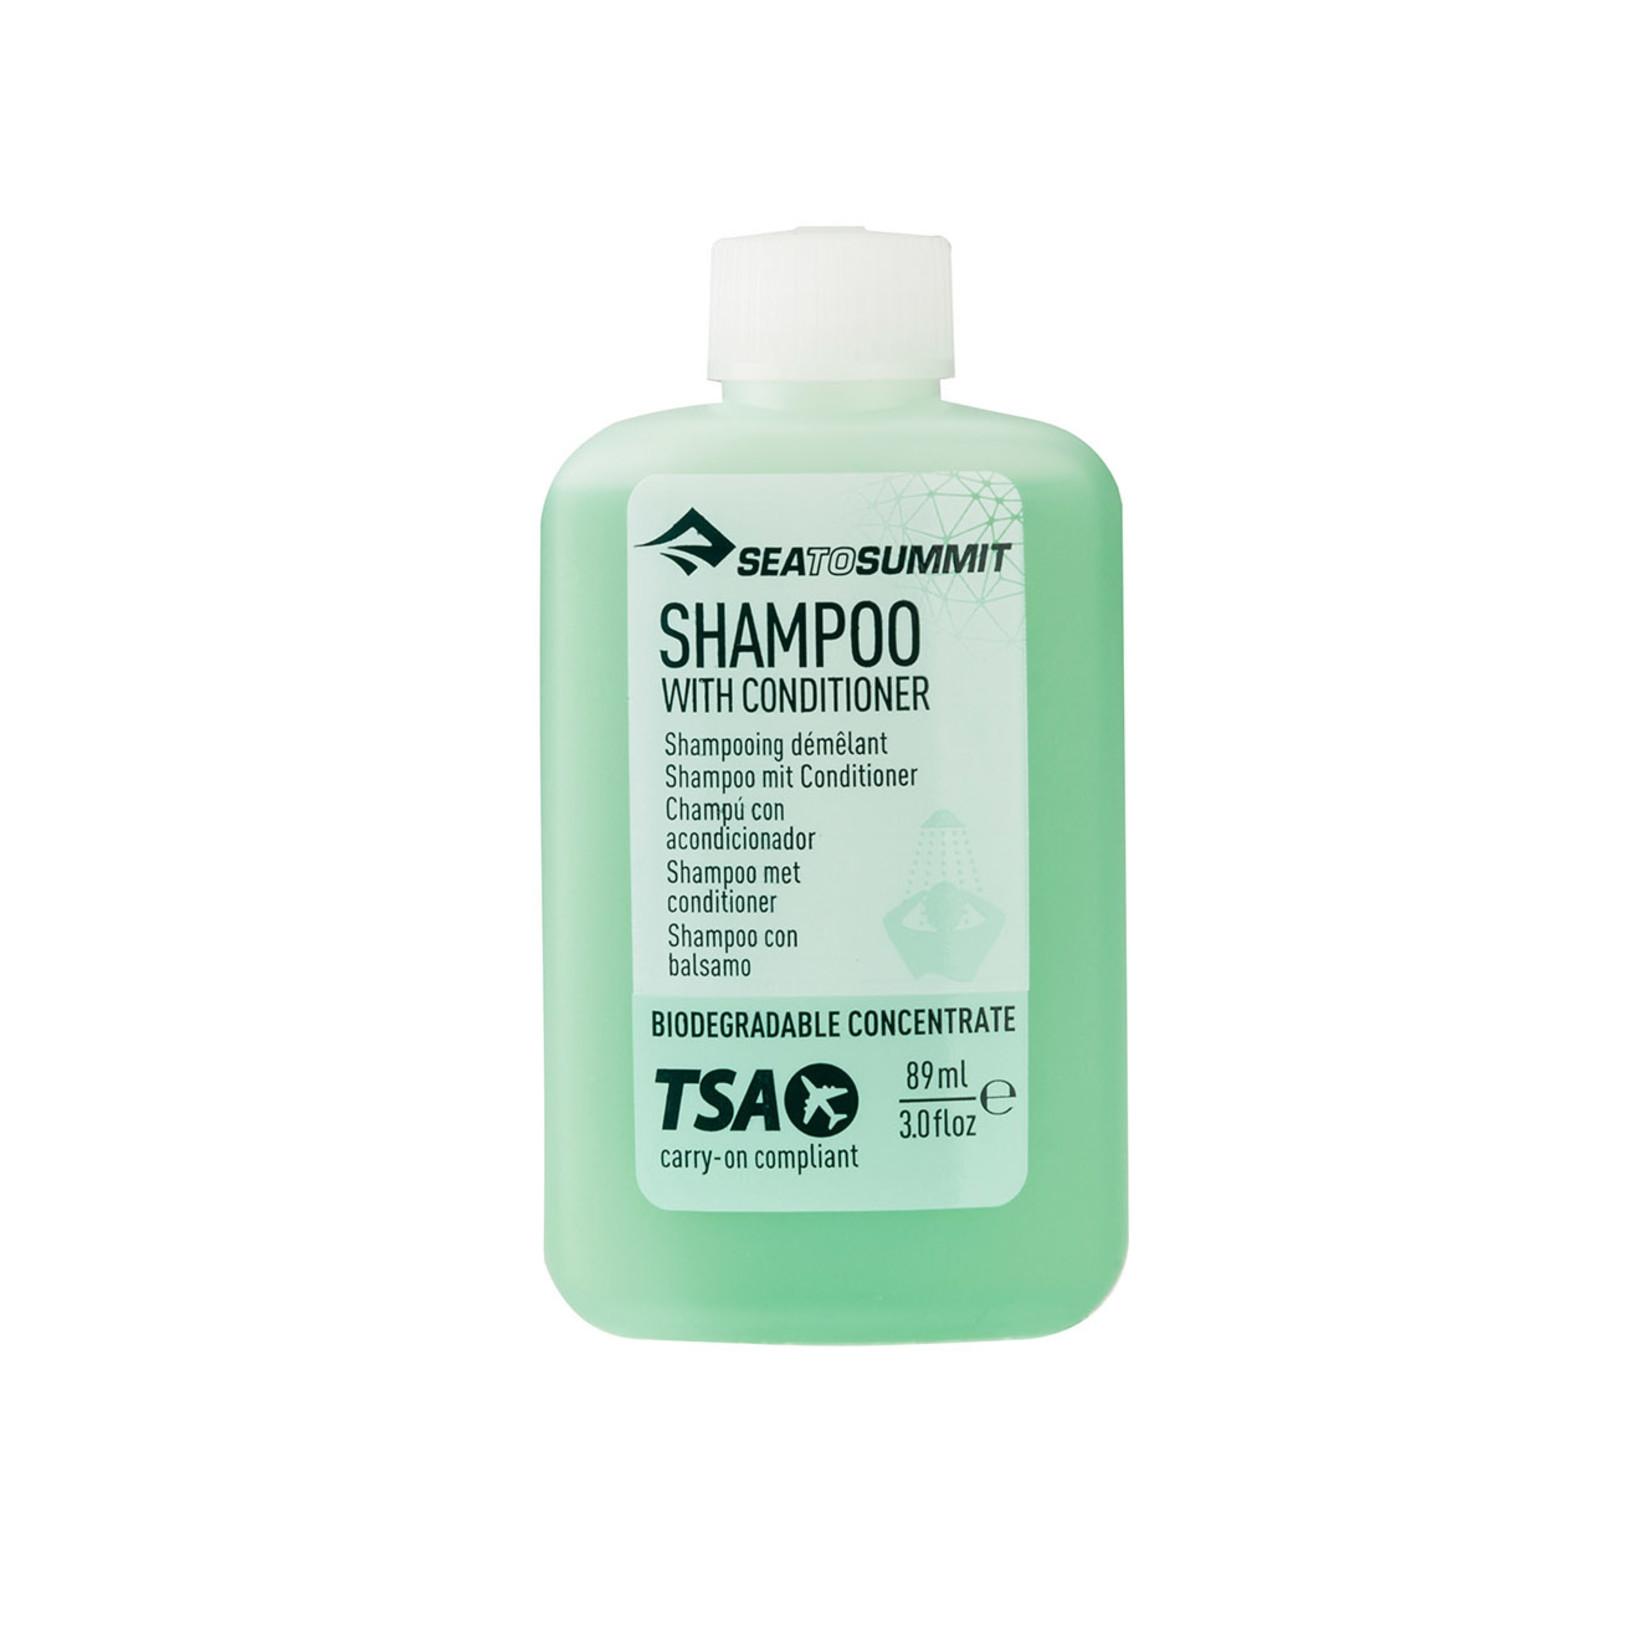 Sea to Summit Sea to Summit, Trek & Travel Liquid Conditioning Shampoo